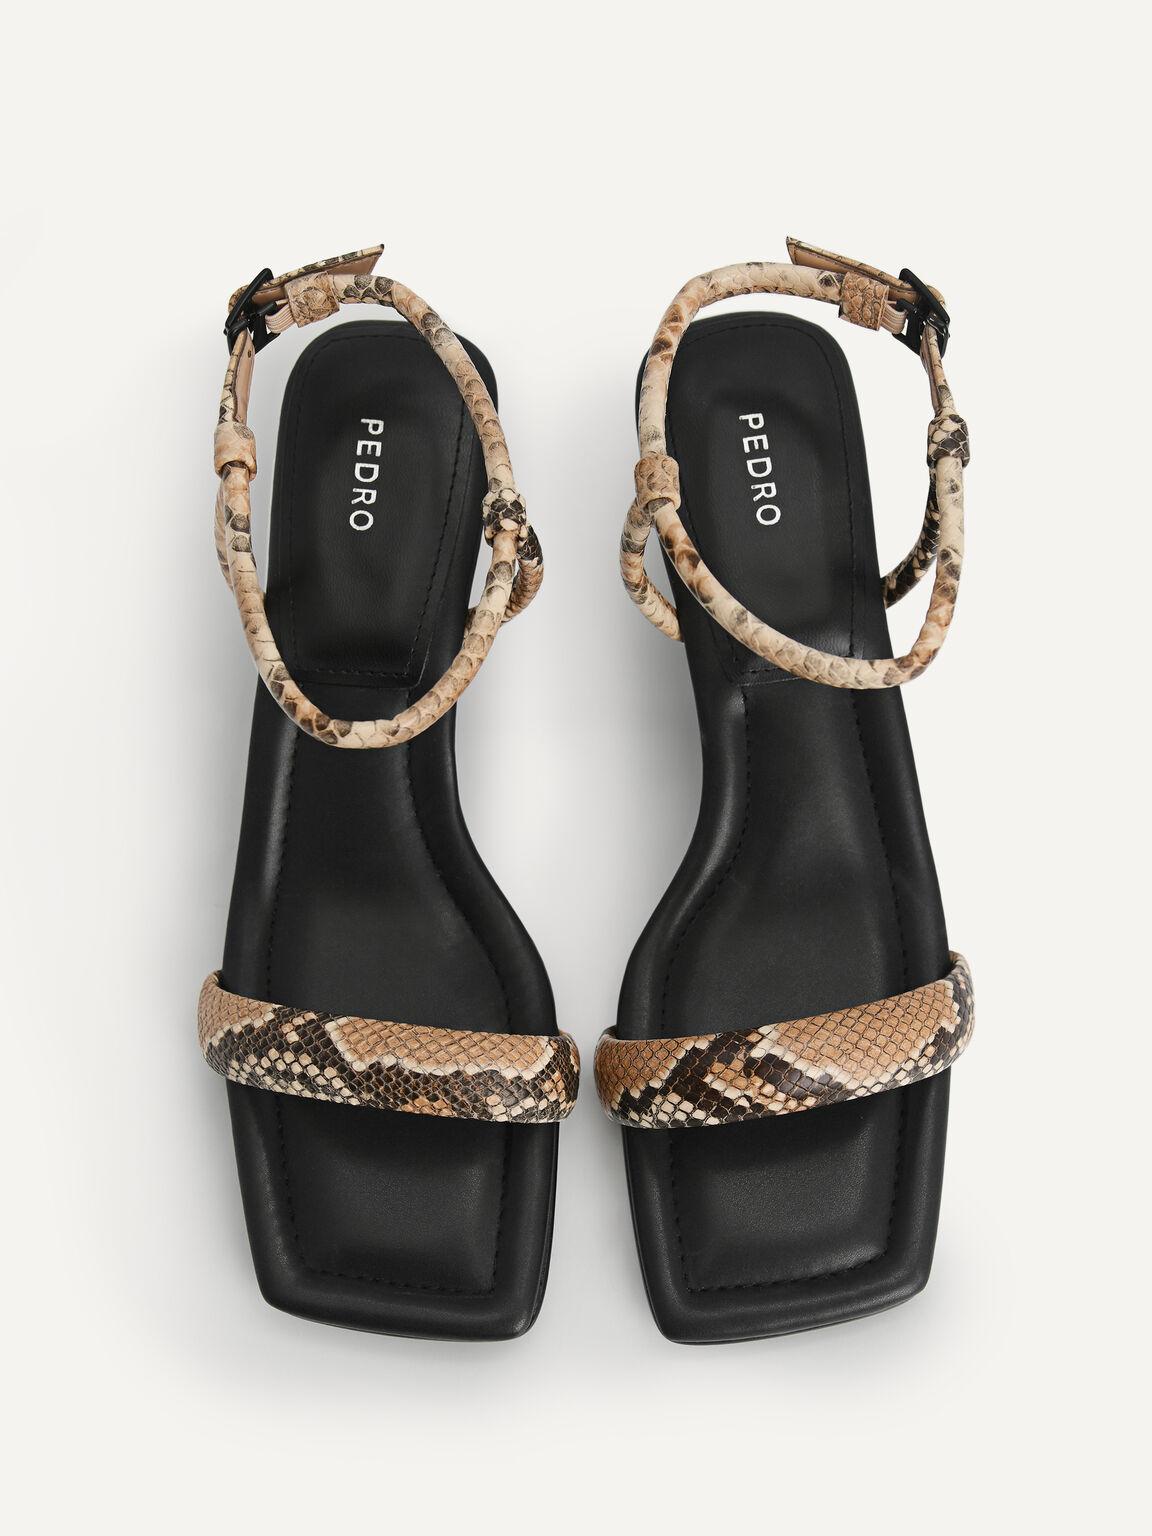 Snake-Effect Strappy Heeled Sandals, Multi, hi-res